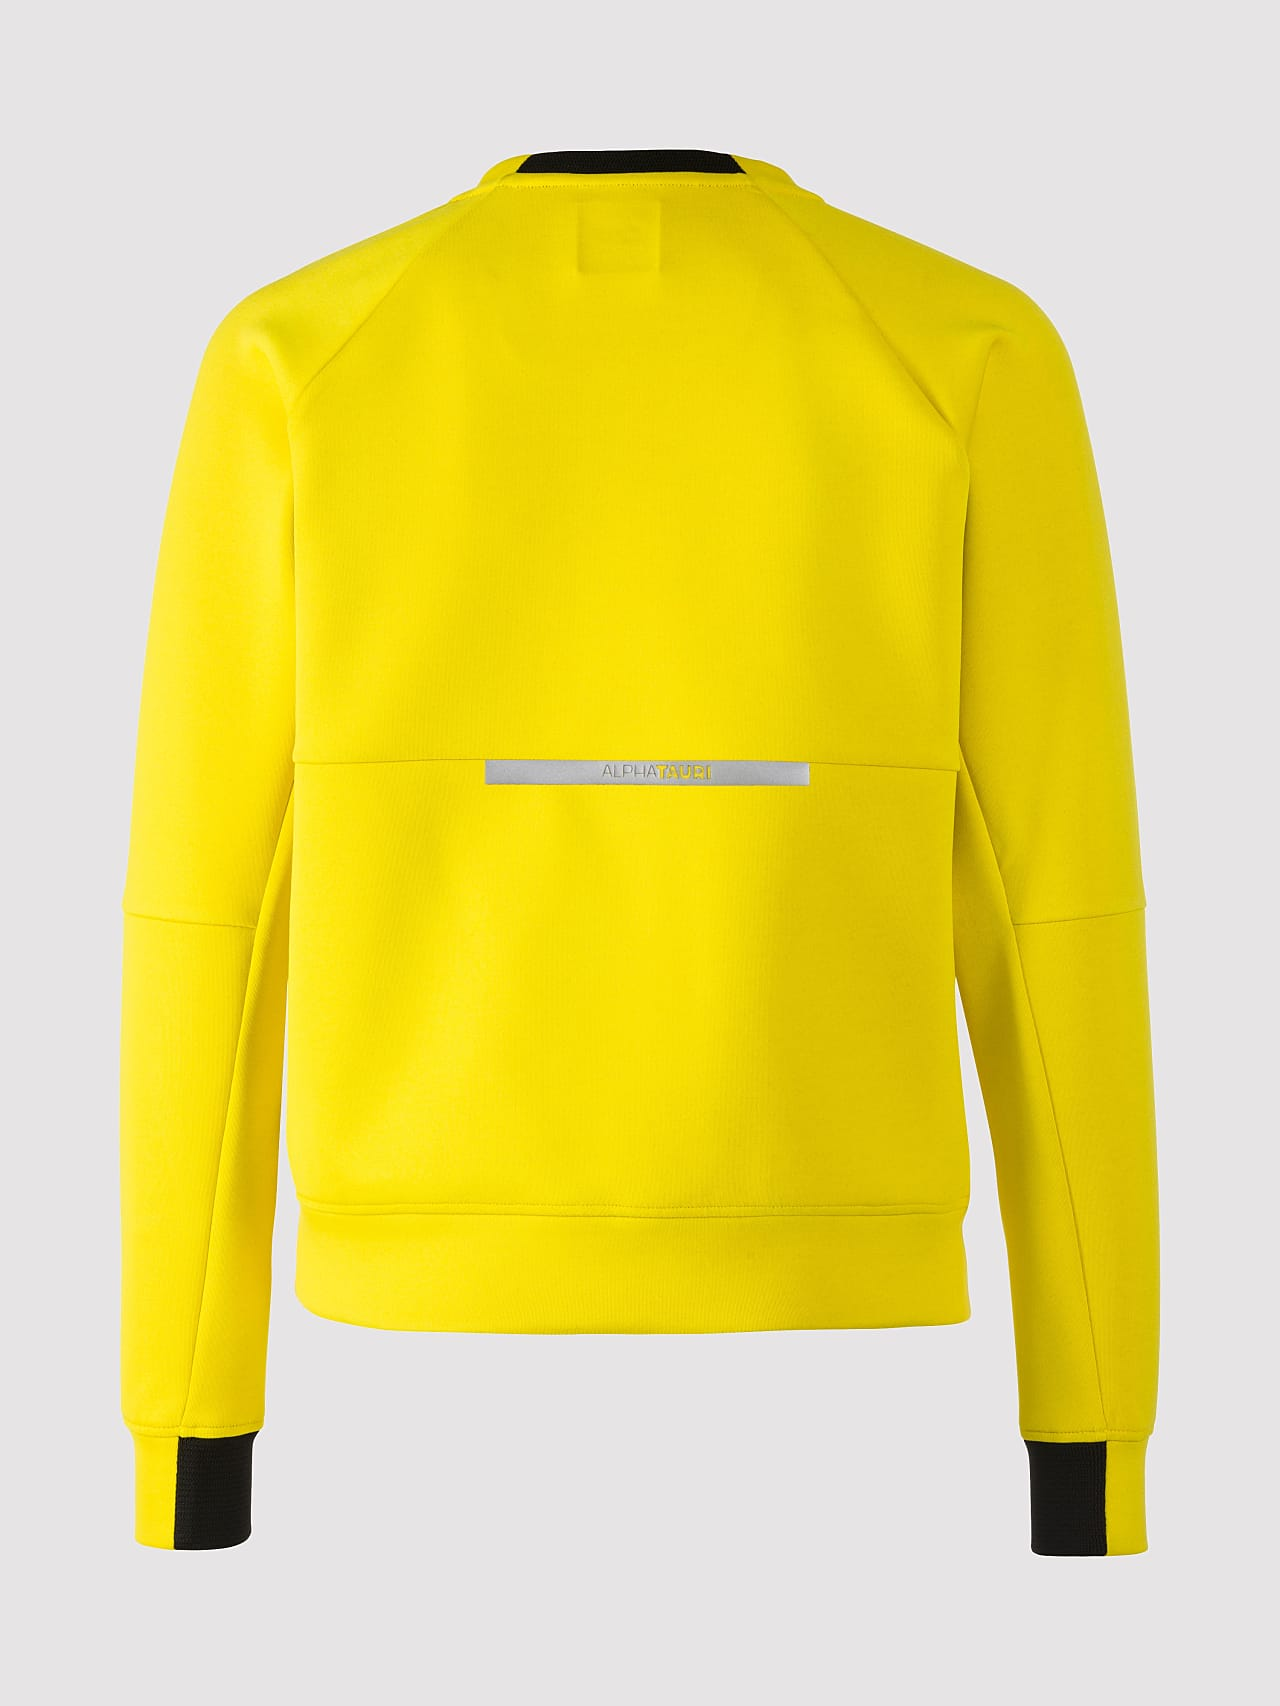 SINOV V1.Y5.01 Crewneck Sweater yellow Left Alpha Tauri